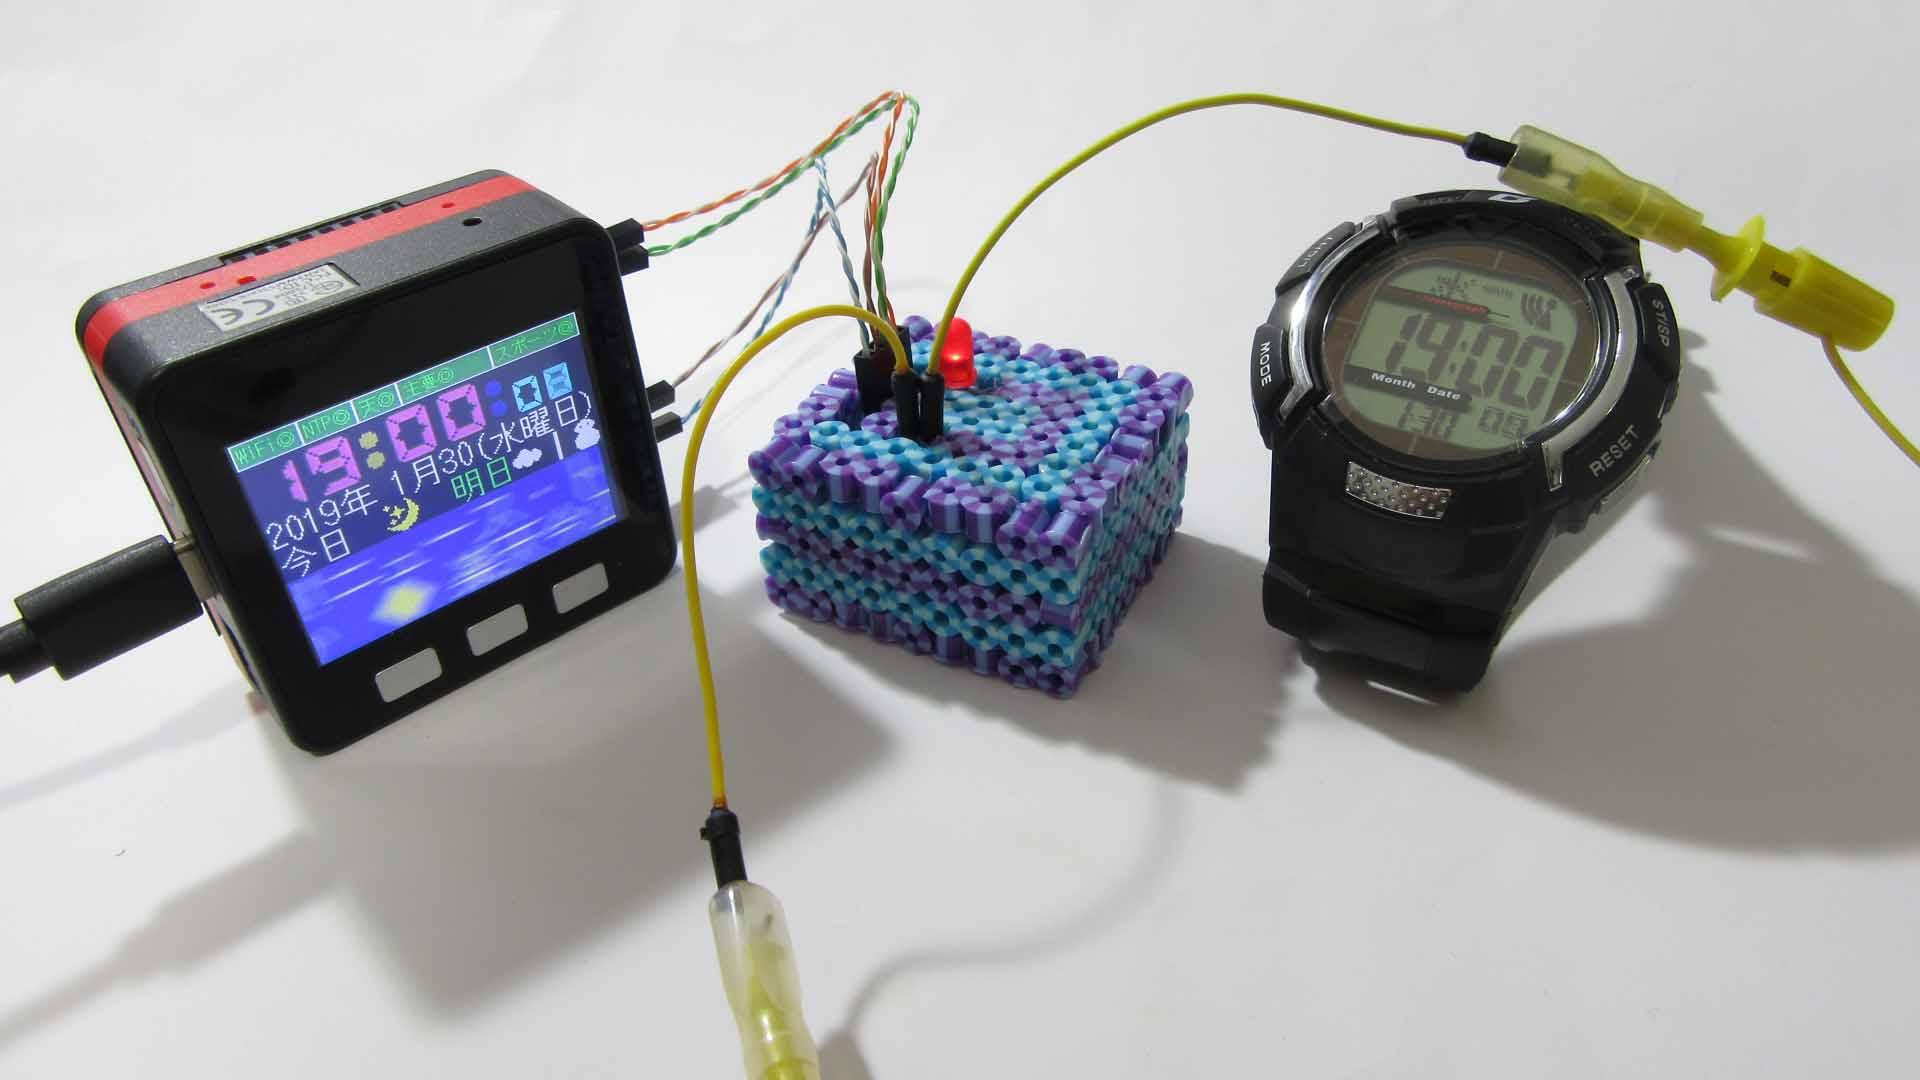 M5Stack Yahooニュース・天気予報・時計に、電波時計  JJY 発信モジュールを追加して、マルチタスクで動かしてみた